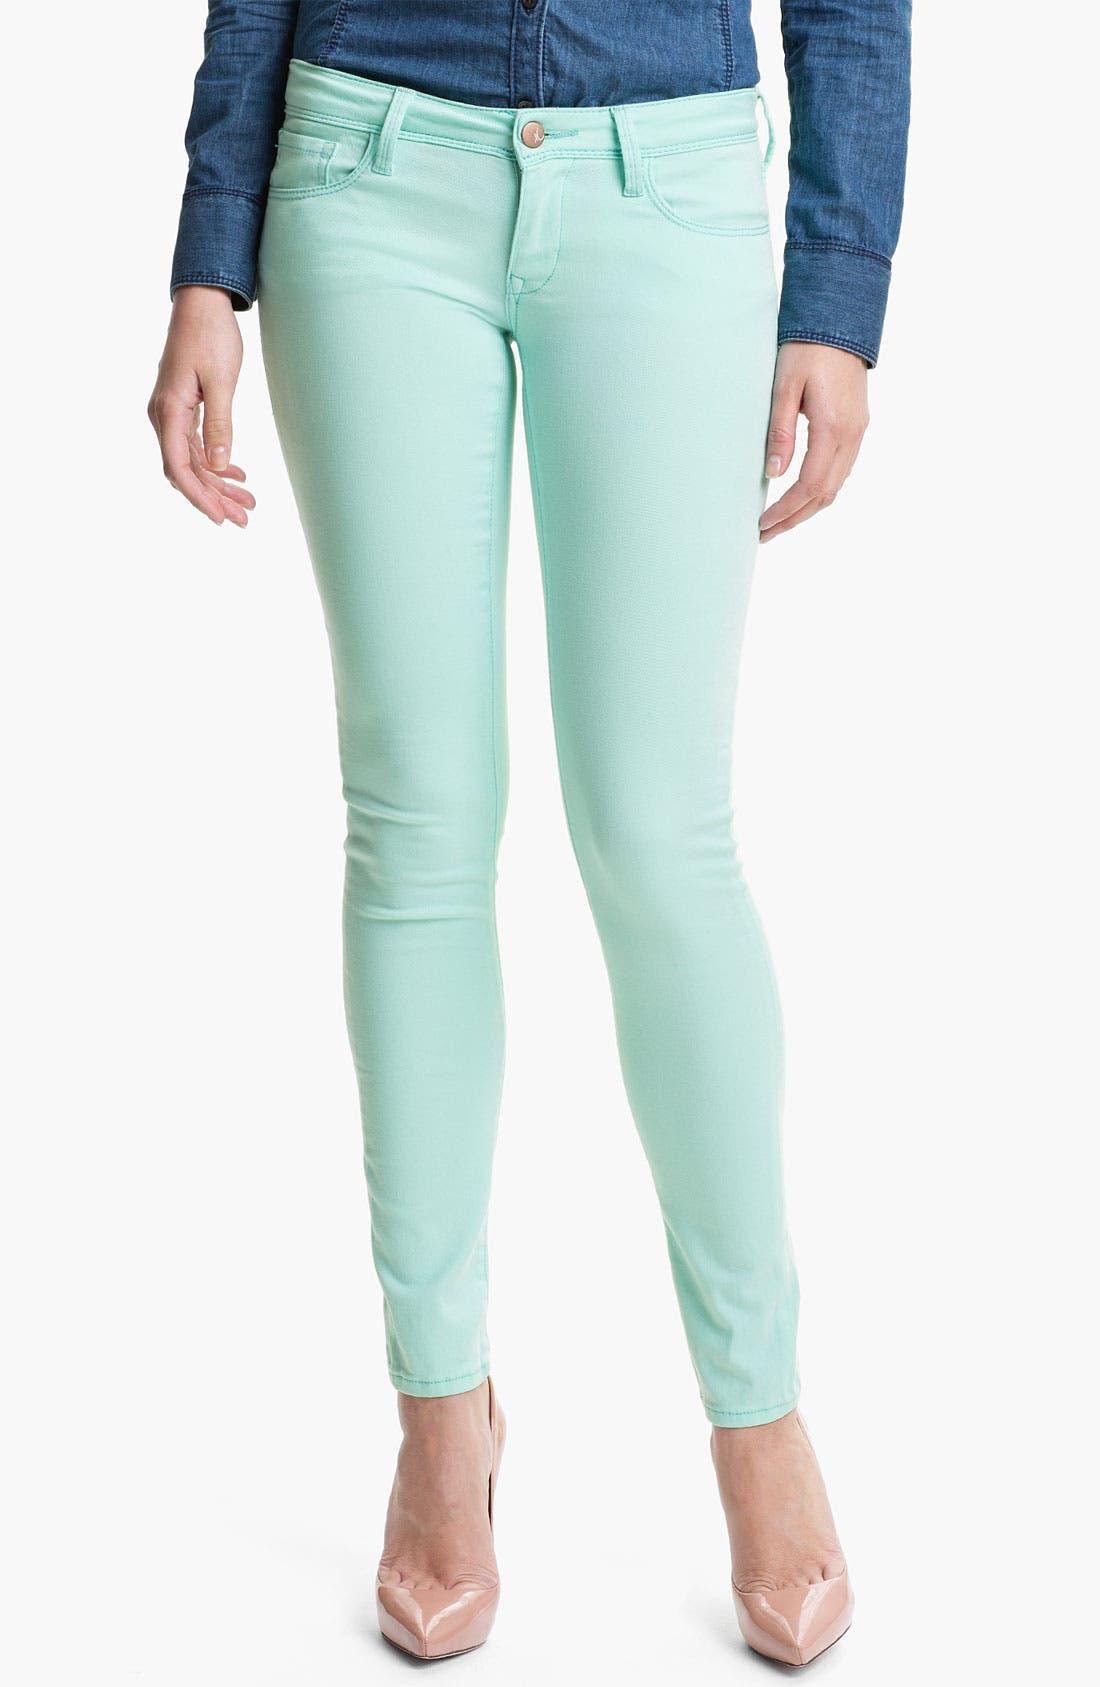 Main Image - Mavi Jeans 'Serena' Low Rise Super Skinny Jeans (Online Exclusive)